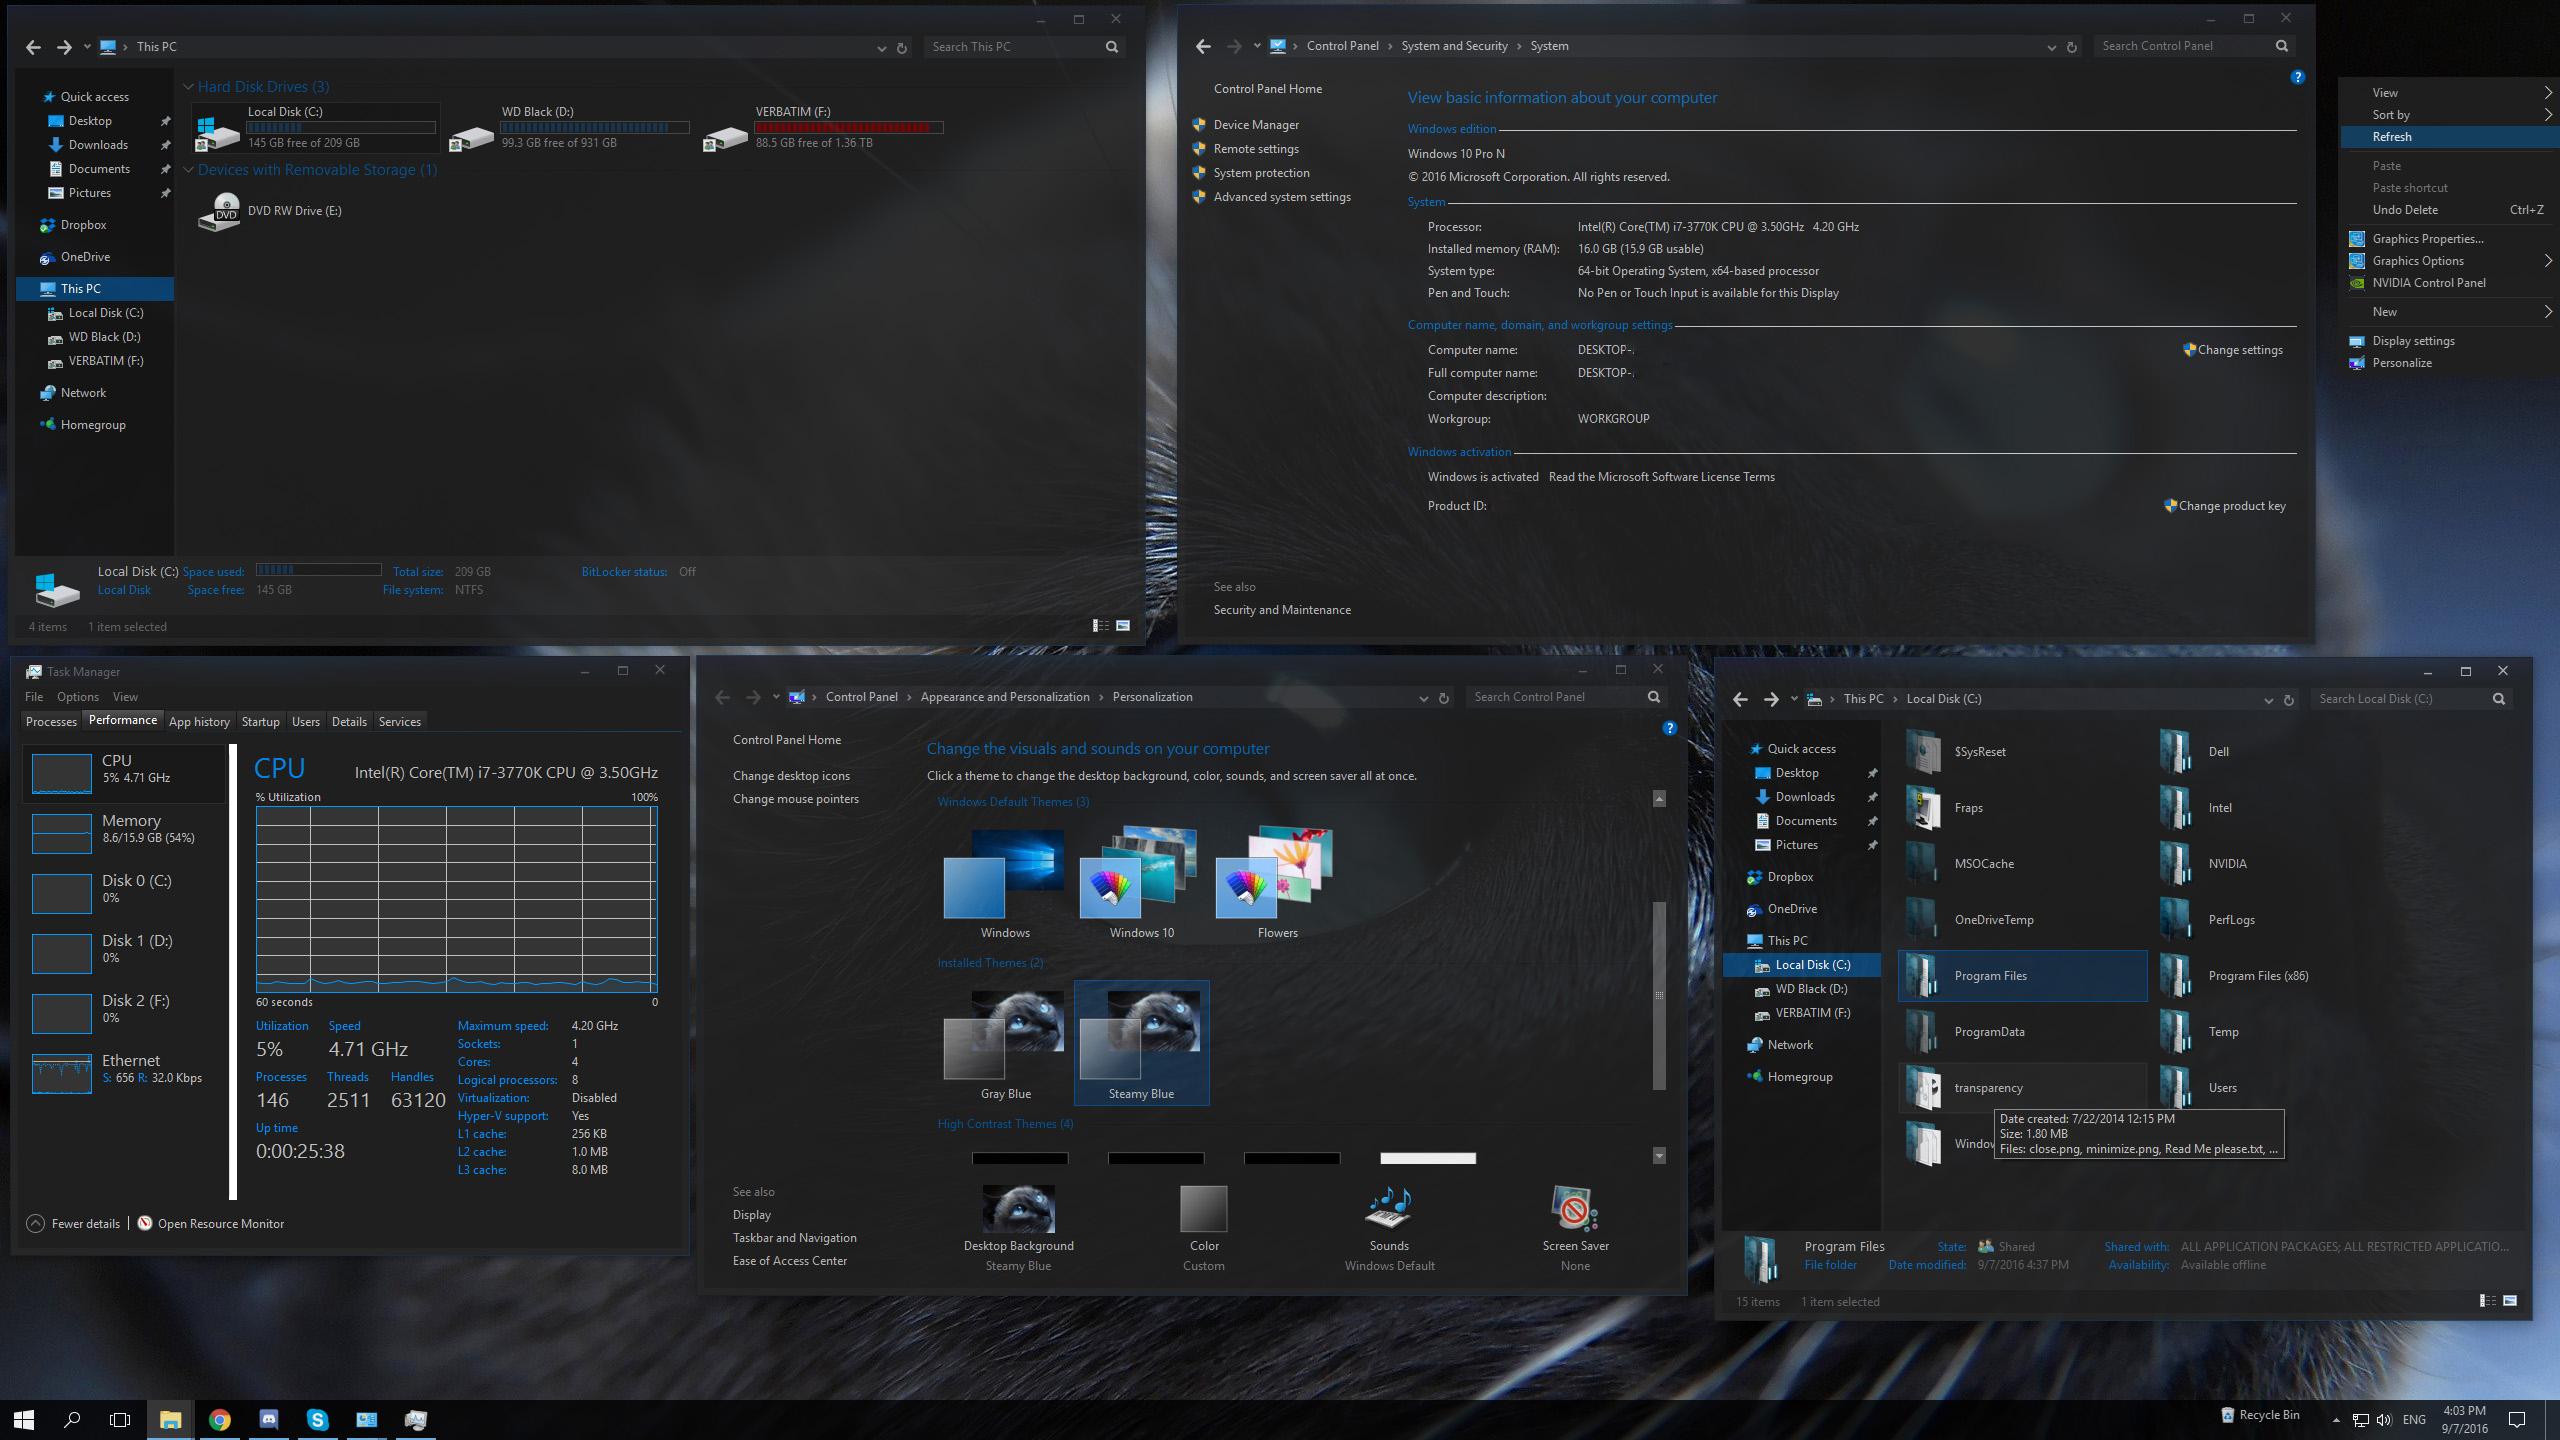 steamyblue windows10 theme by f3nix69 on deviantart On window 10 theme